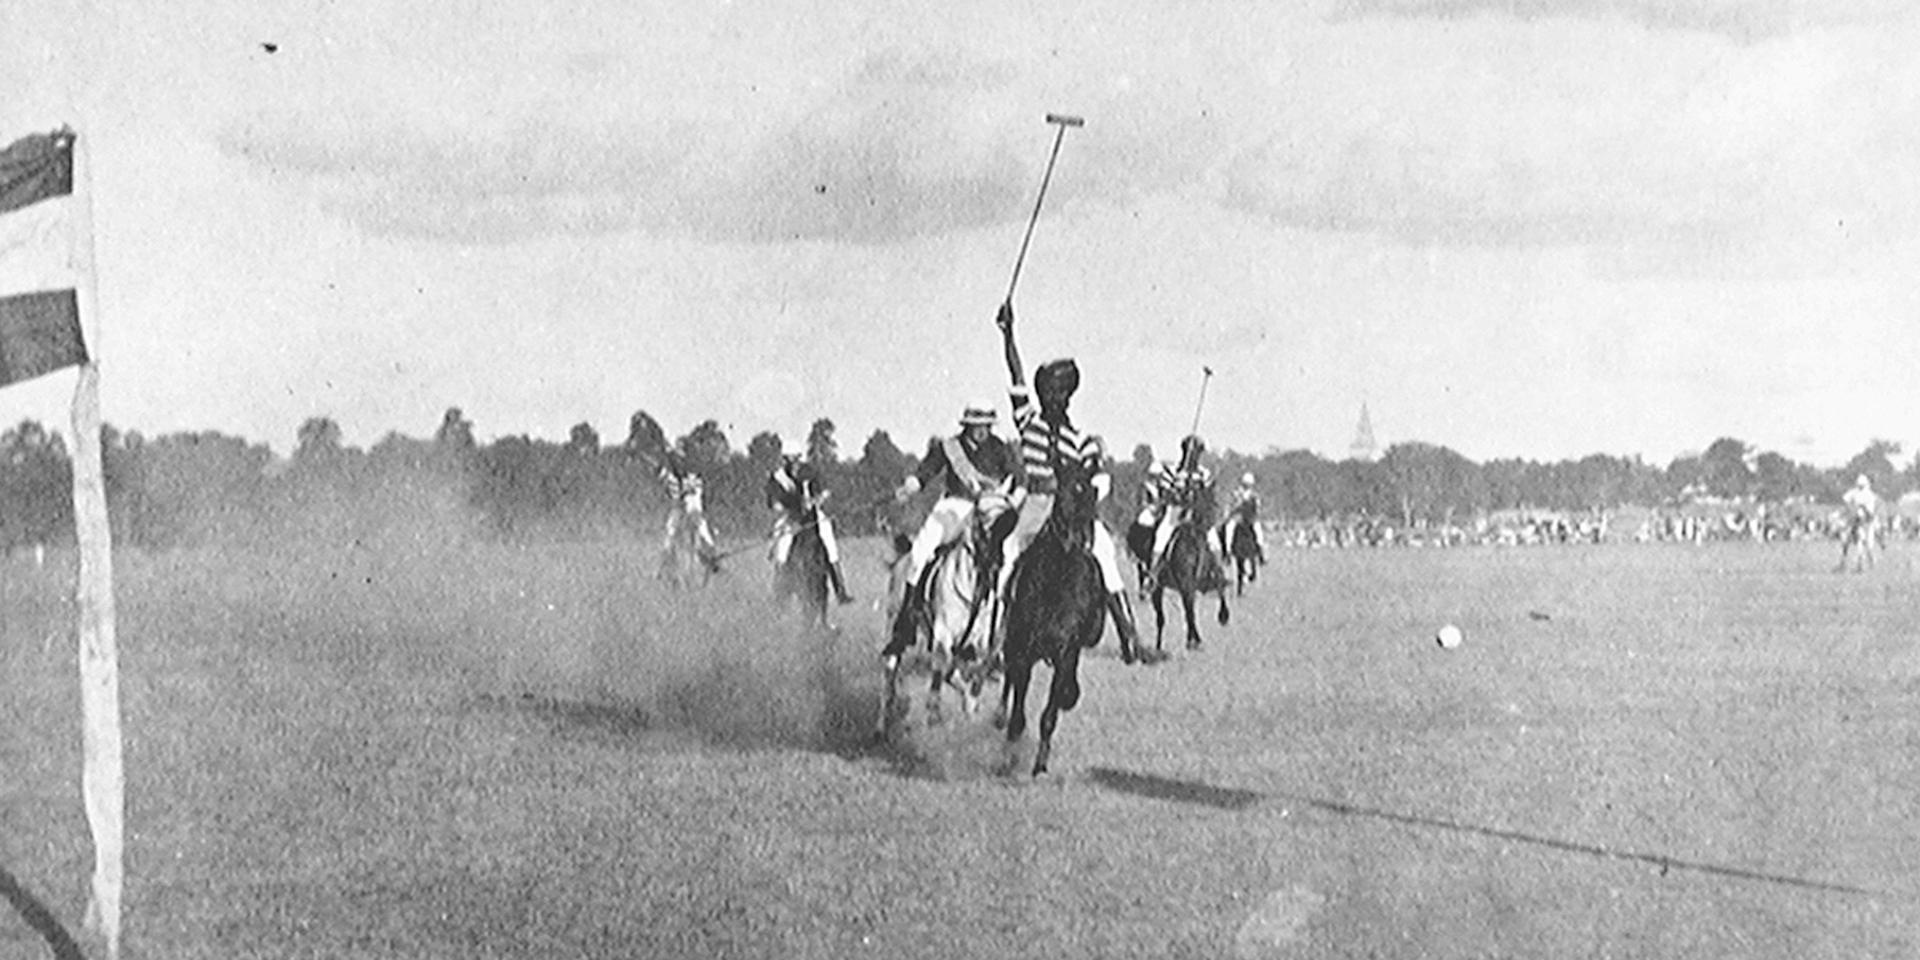 Secunderabad Polo Tournament, India, 1897